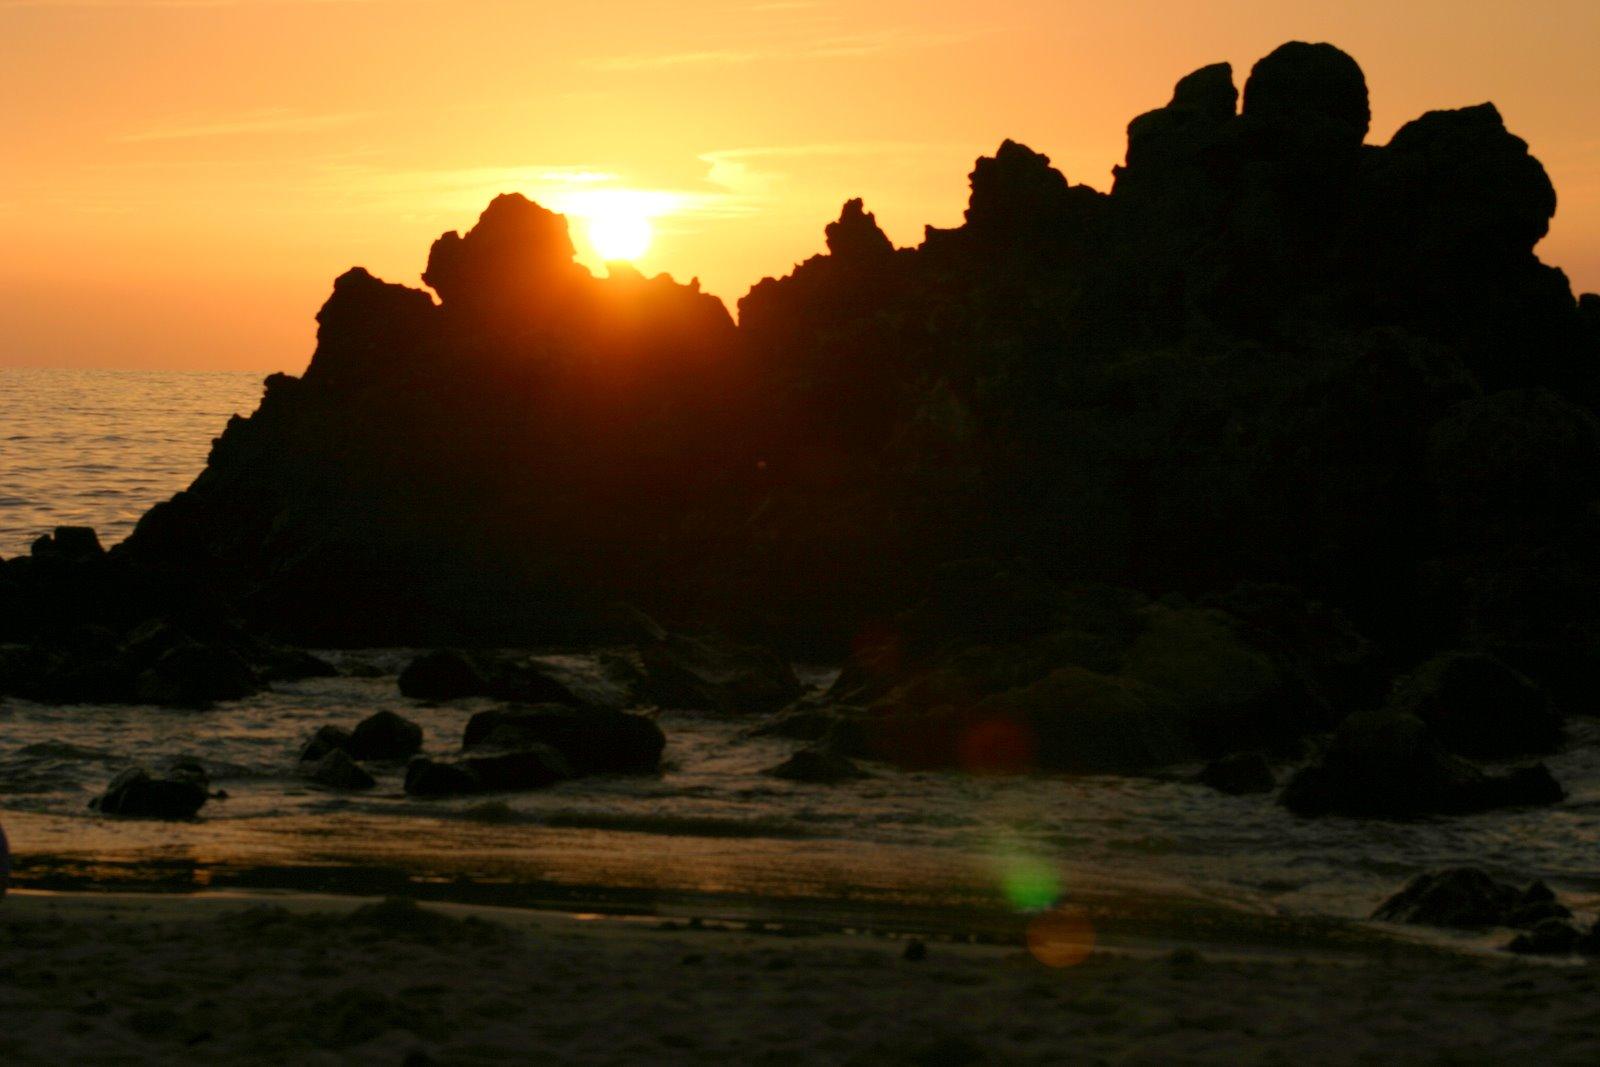 [sunset+in+hawaii]